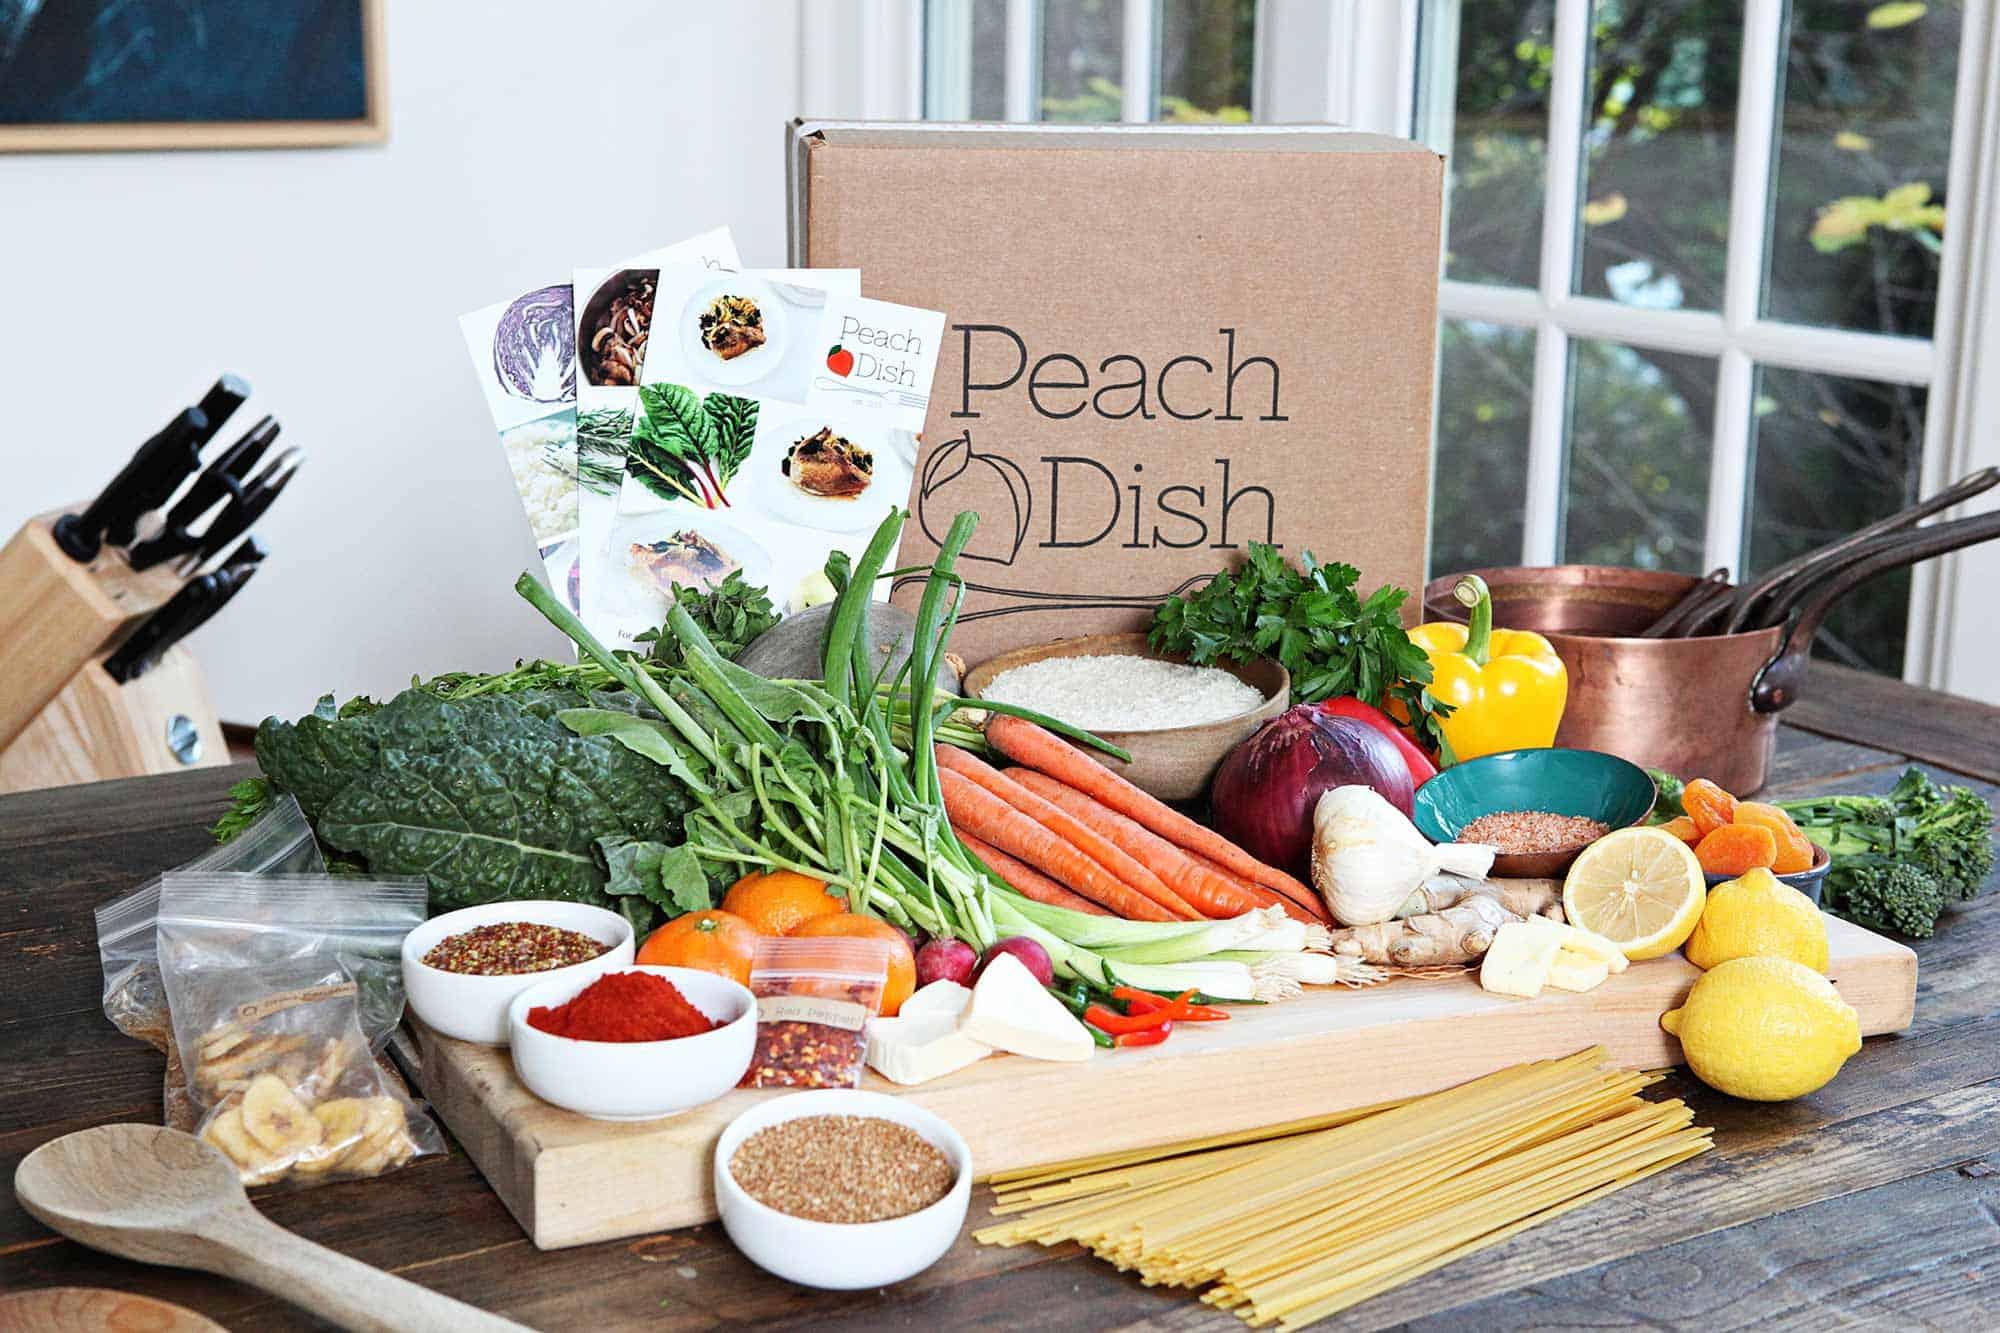 Peachdish – mail order meal service